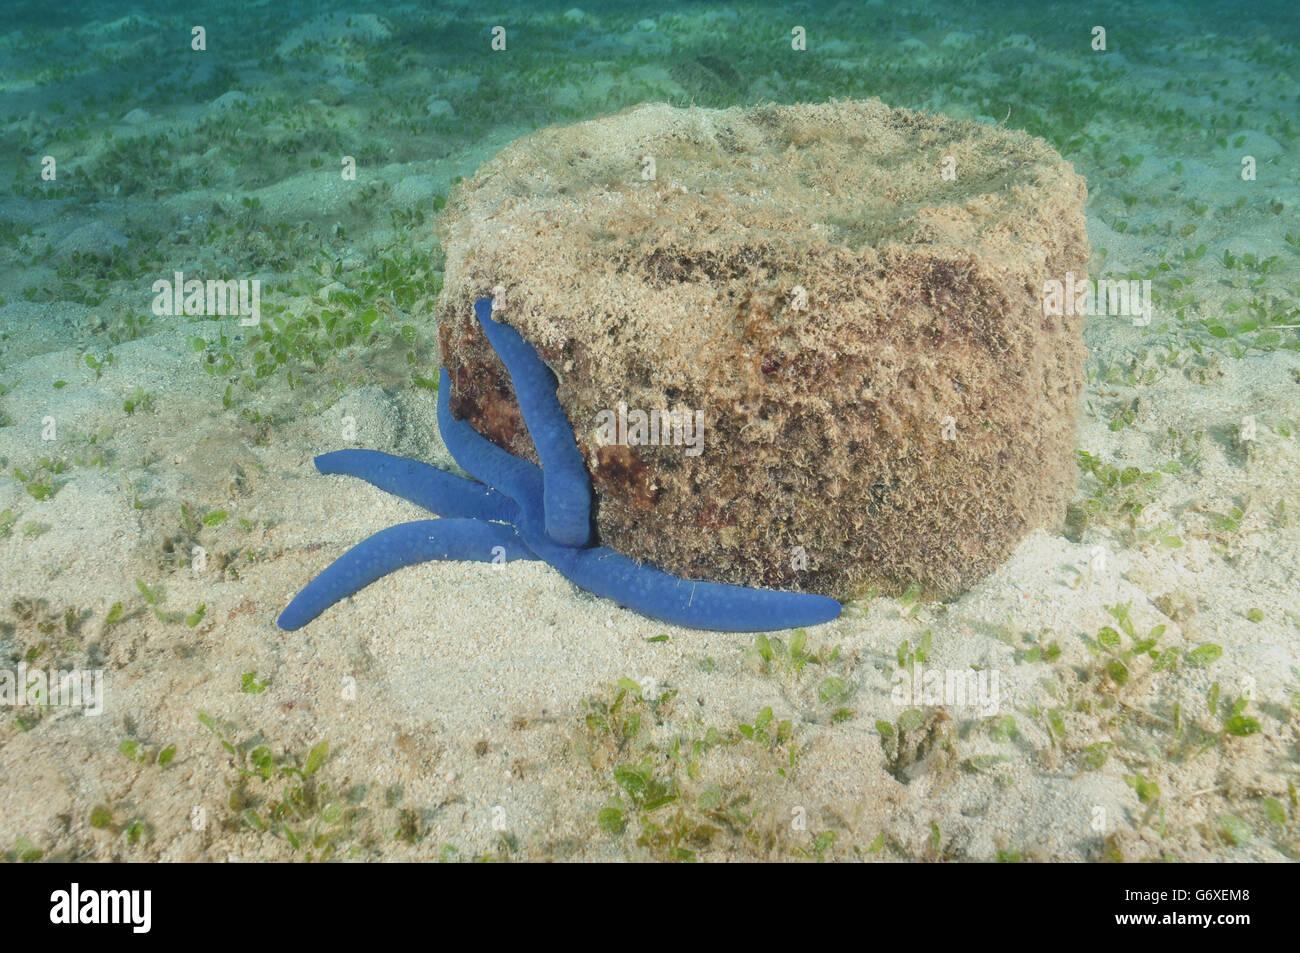 Blue sea star of Pacific ocean - Stock Image